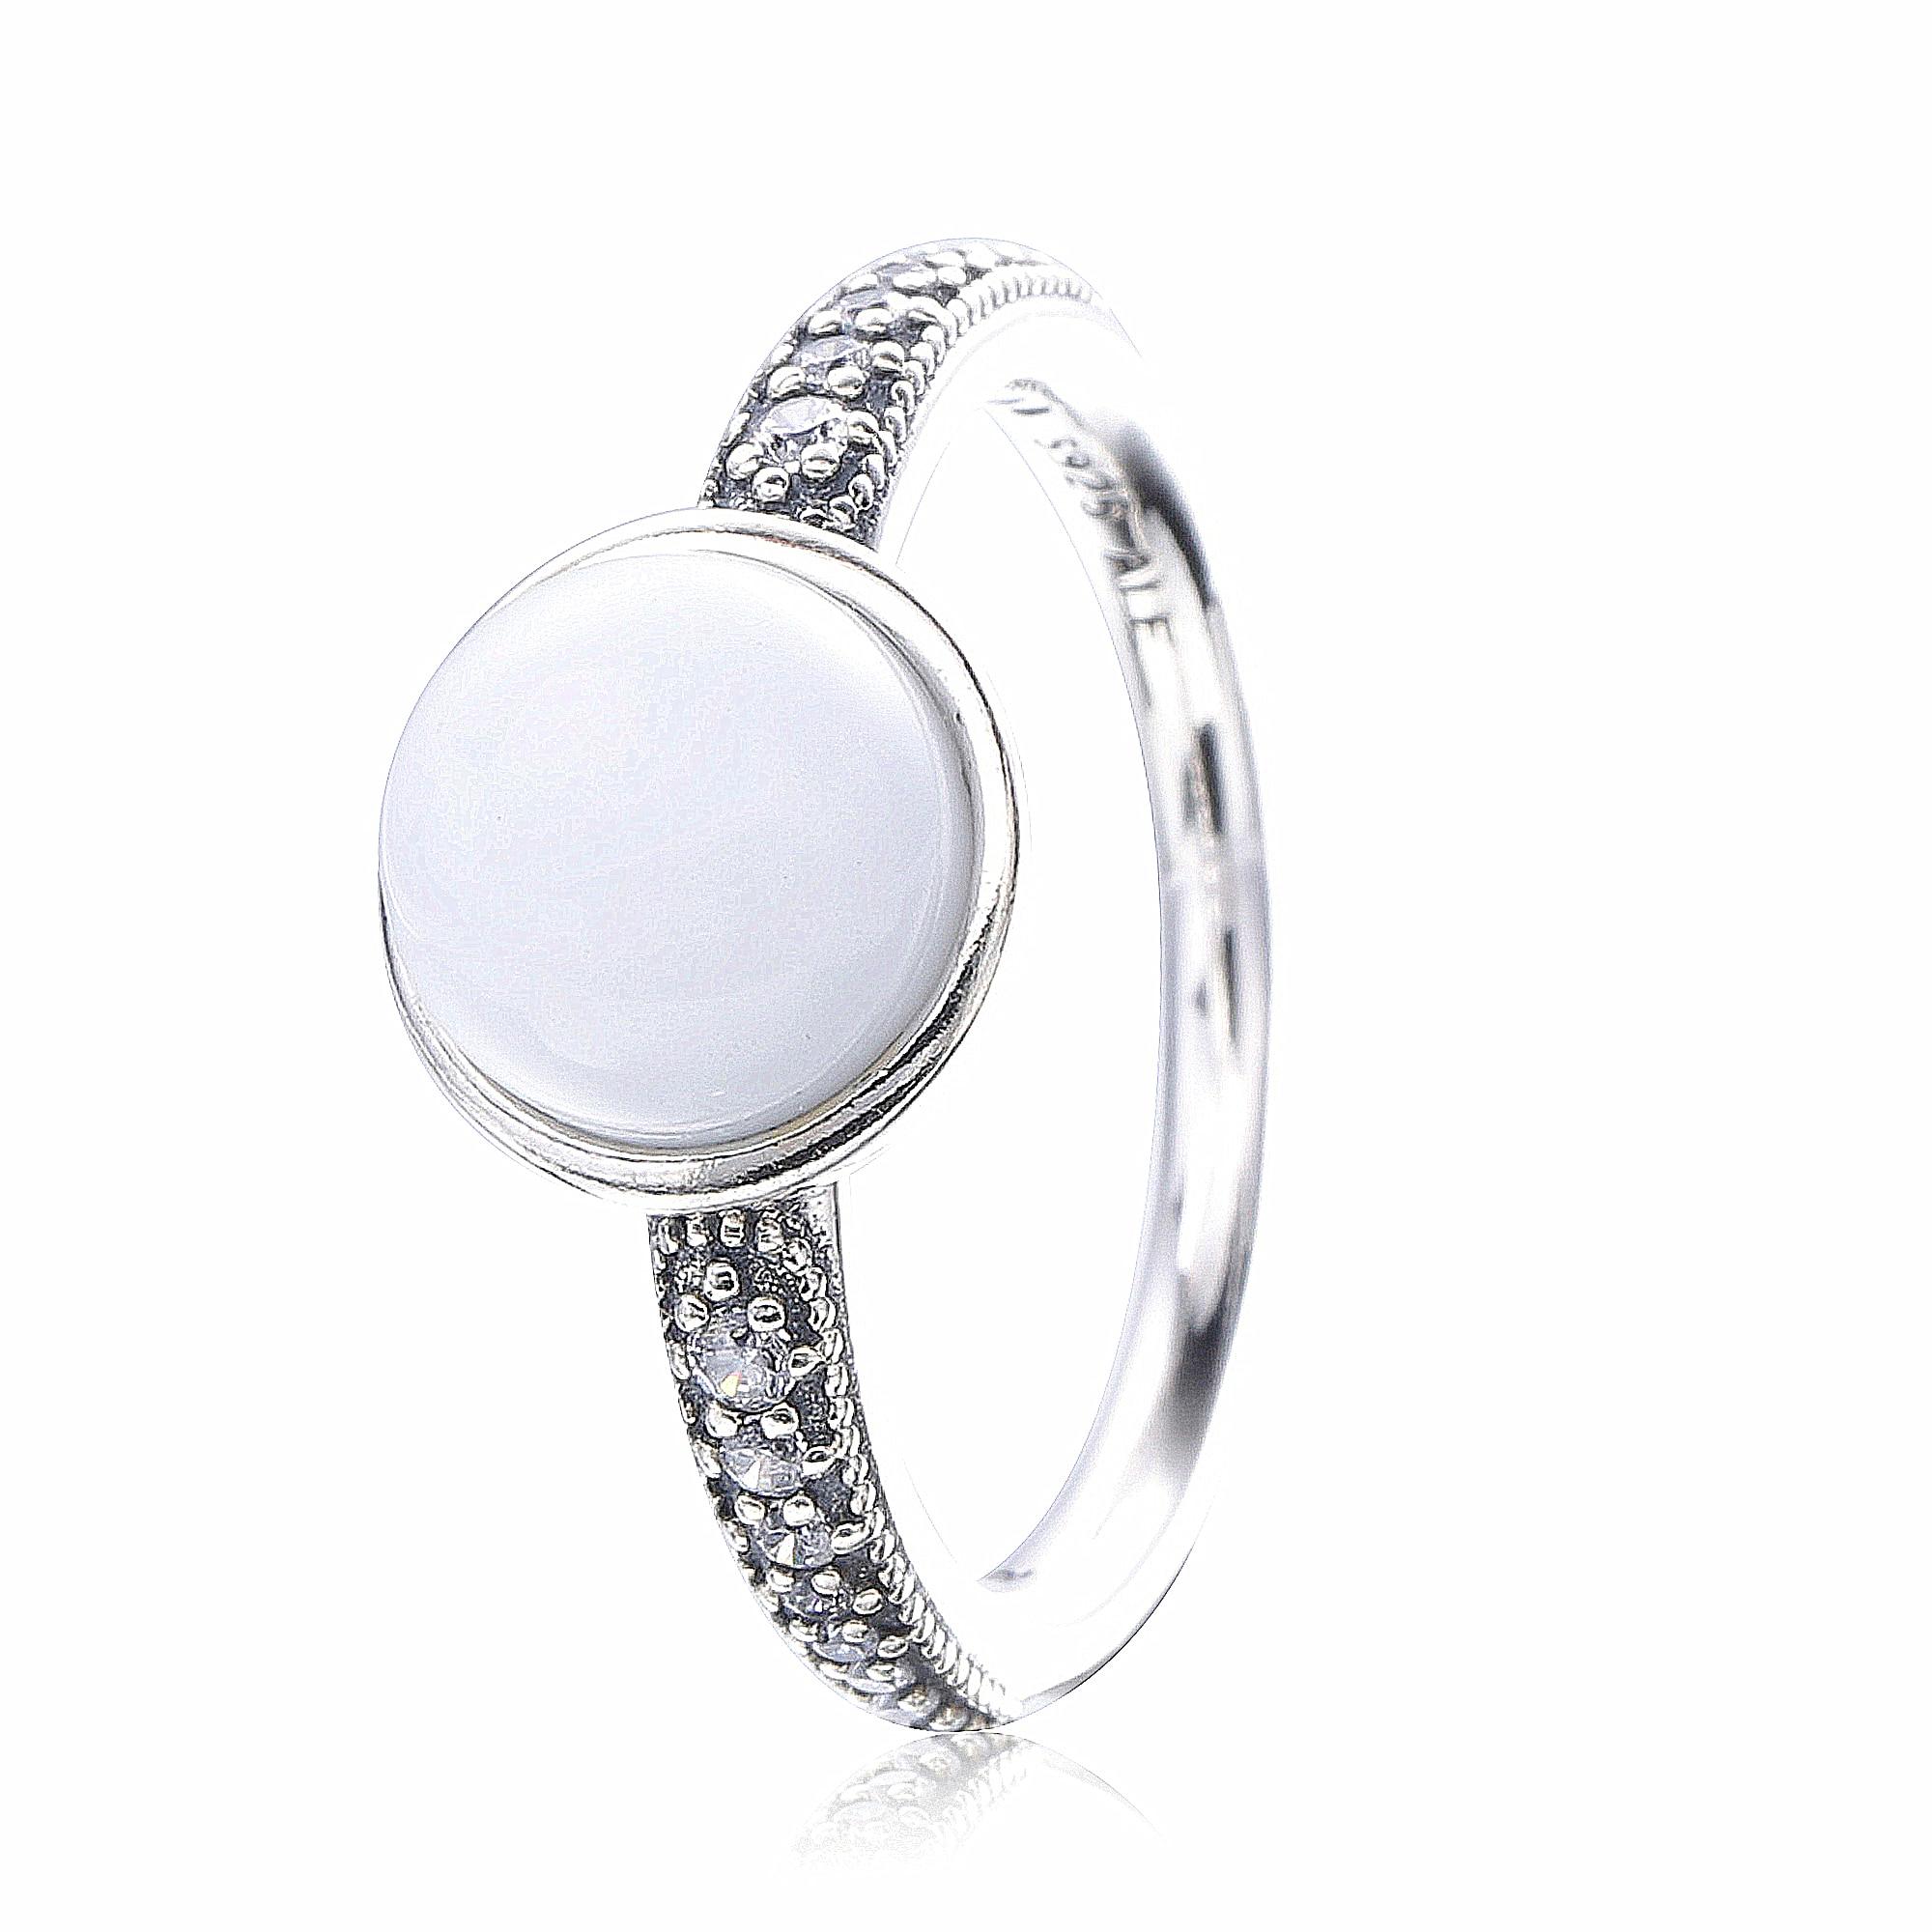 Ajax-Anillo de Plata de Ley 925 con estilo para mujer, anillos de...